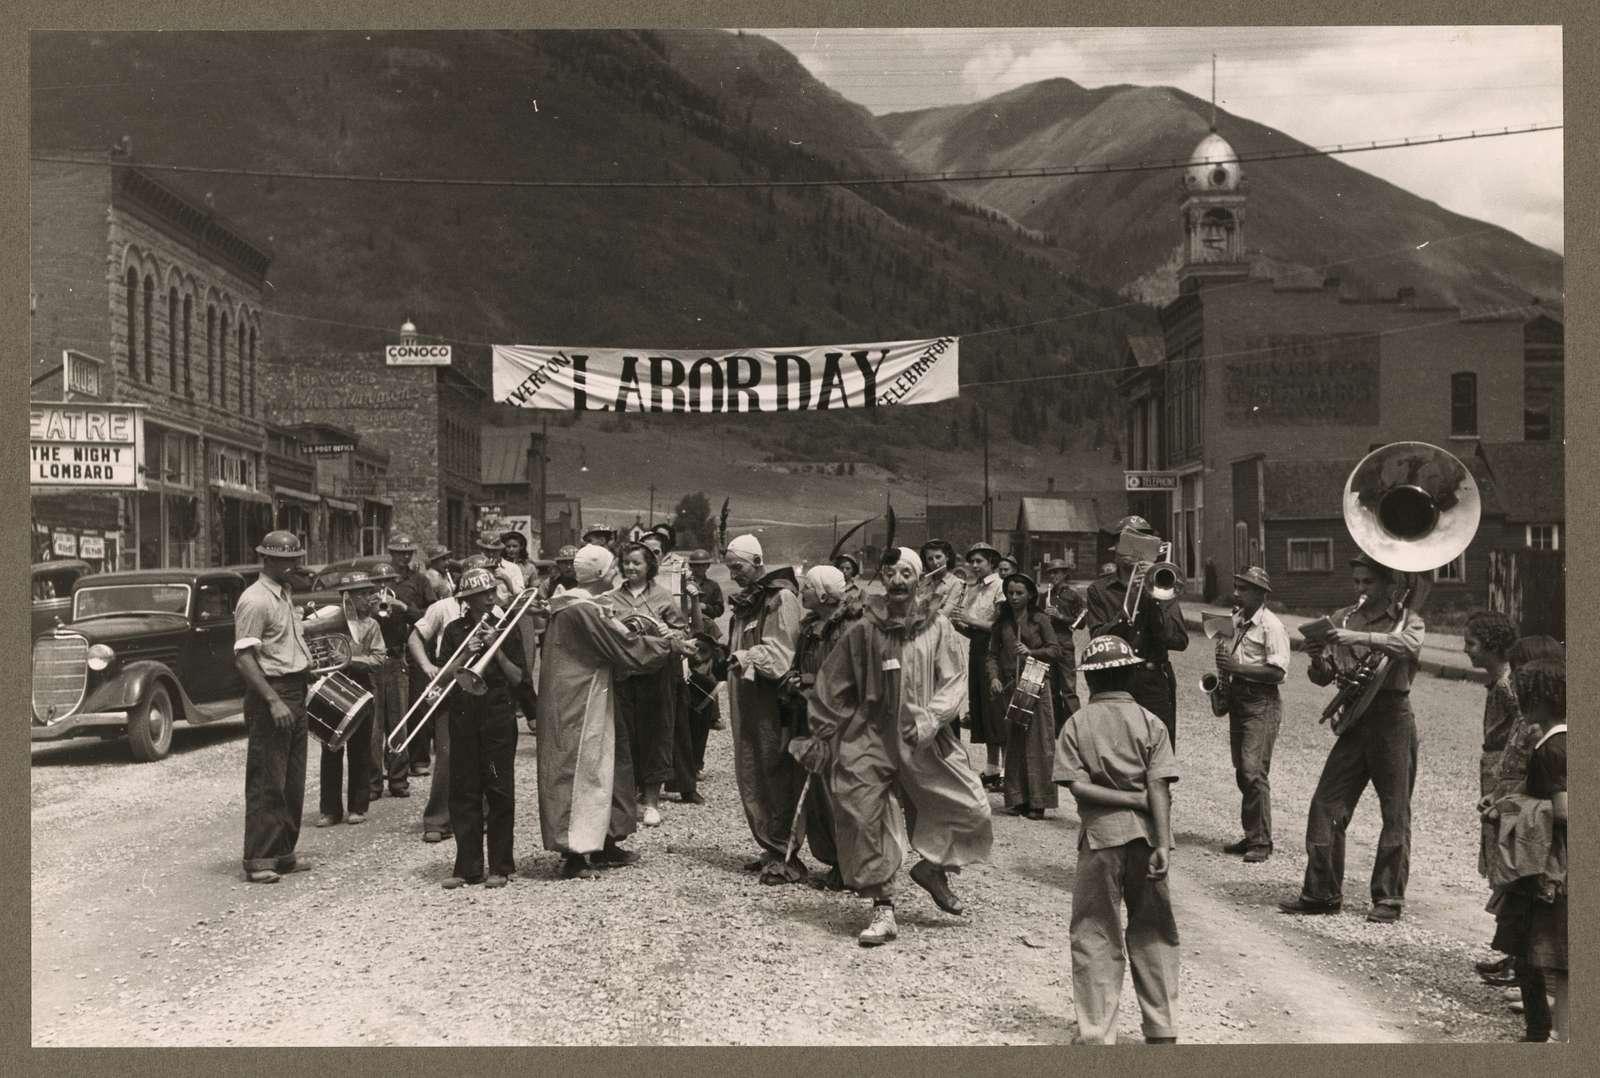 Band and clowns at Labor Day celebration, Silverton, Colorado